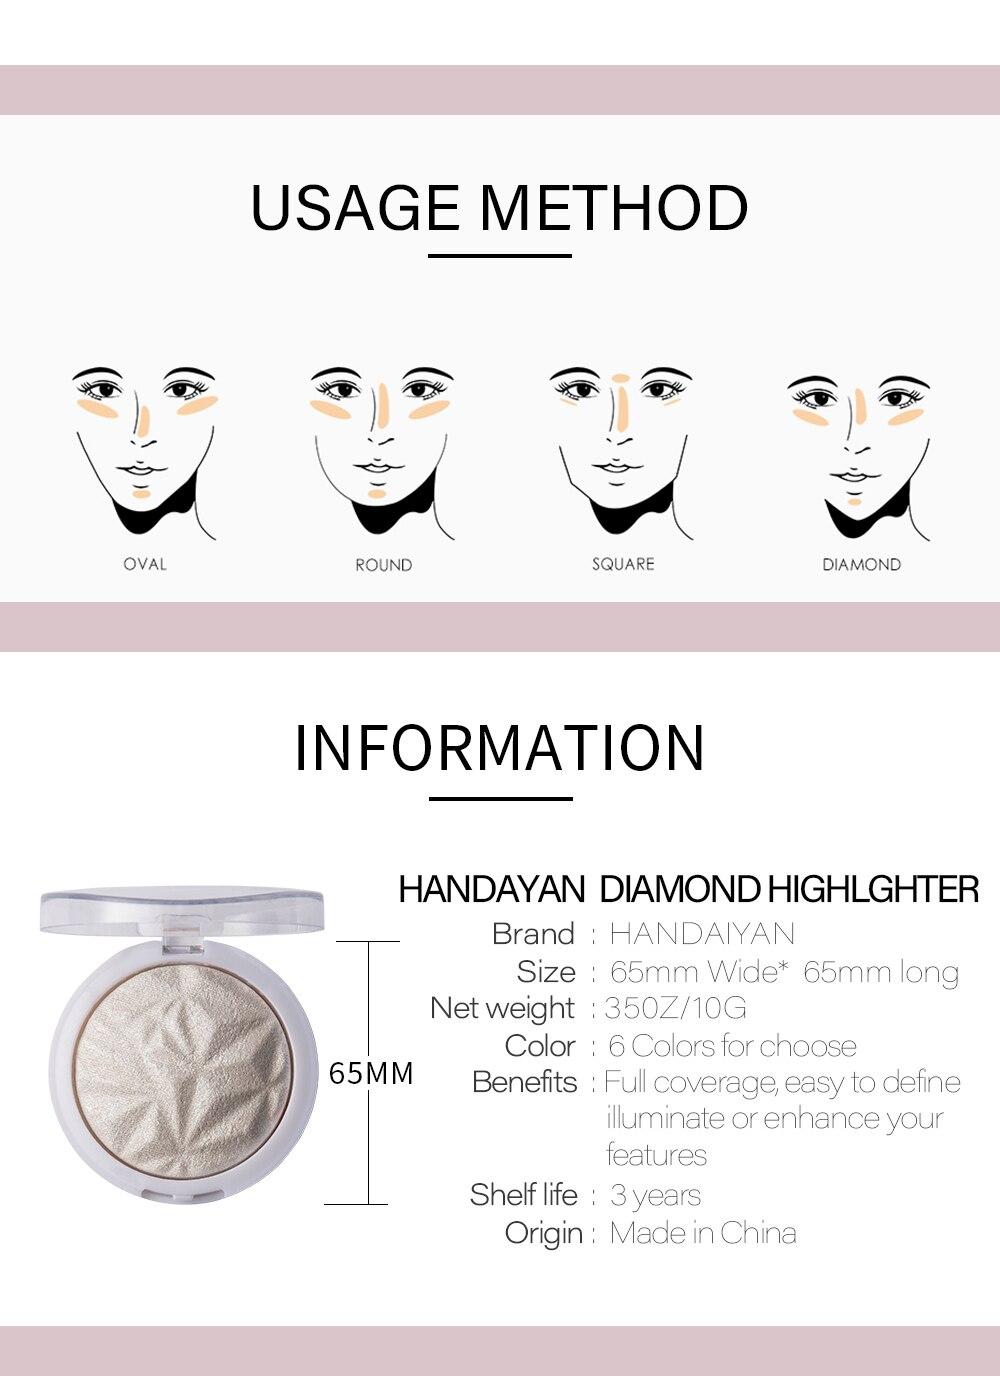 NEW! Beauty Makeup Shimmer Highlighter&Bronzer Stick Diamond Pressed  Waterproof Highlight Palette Concealer Brighten Skin Shimmer Bronzer The  Best